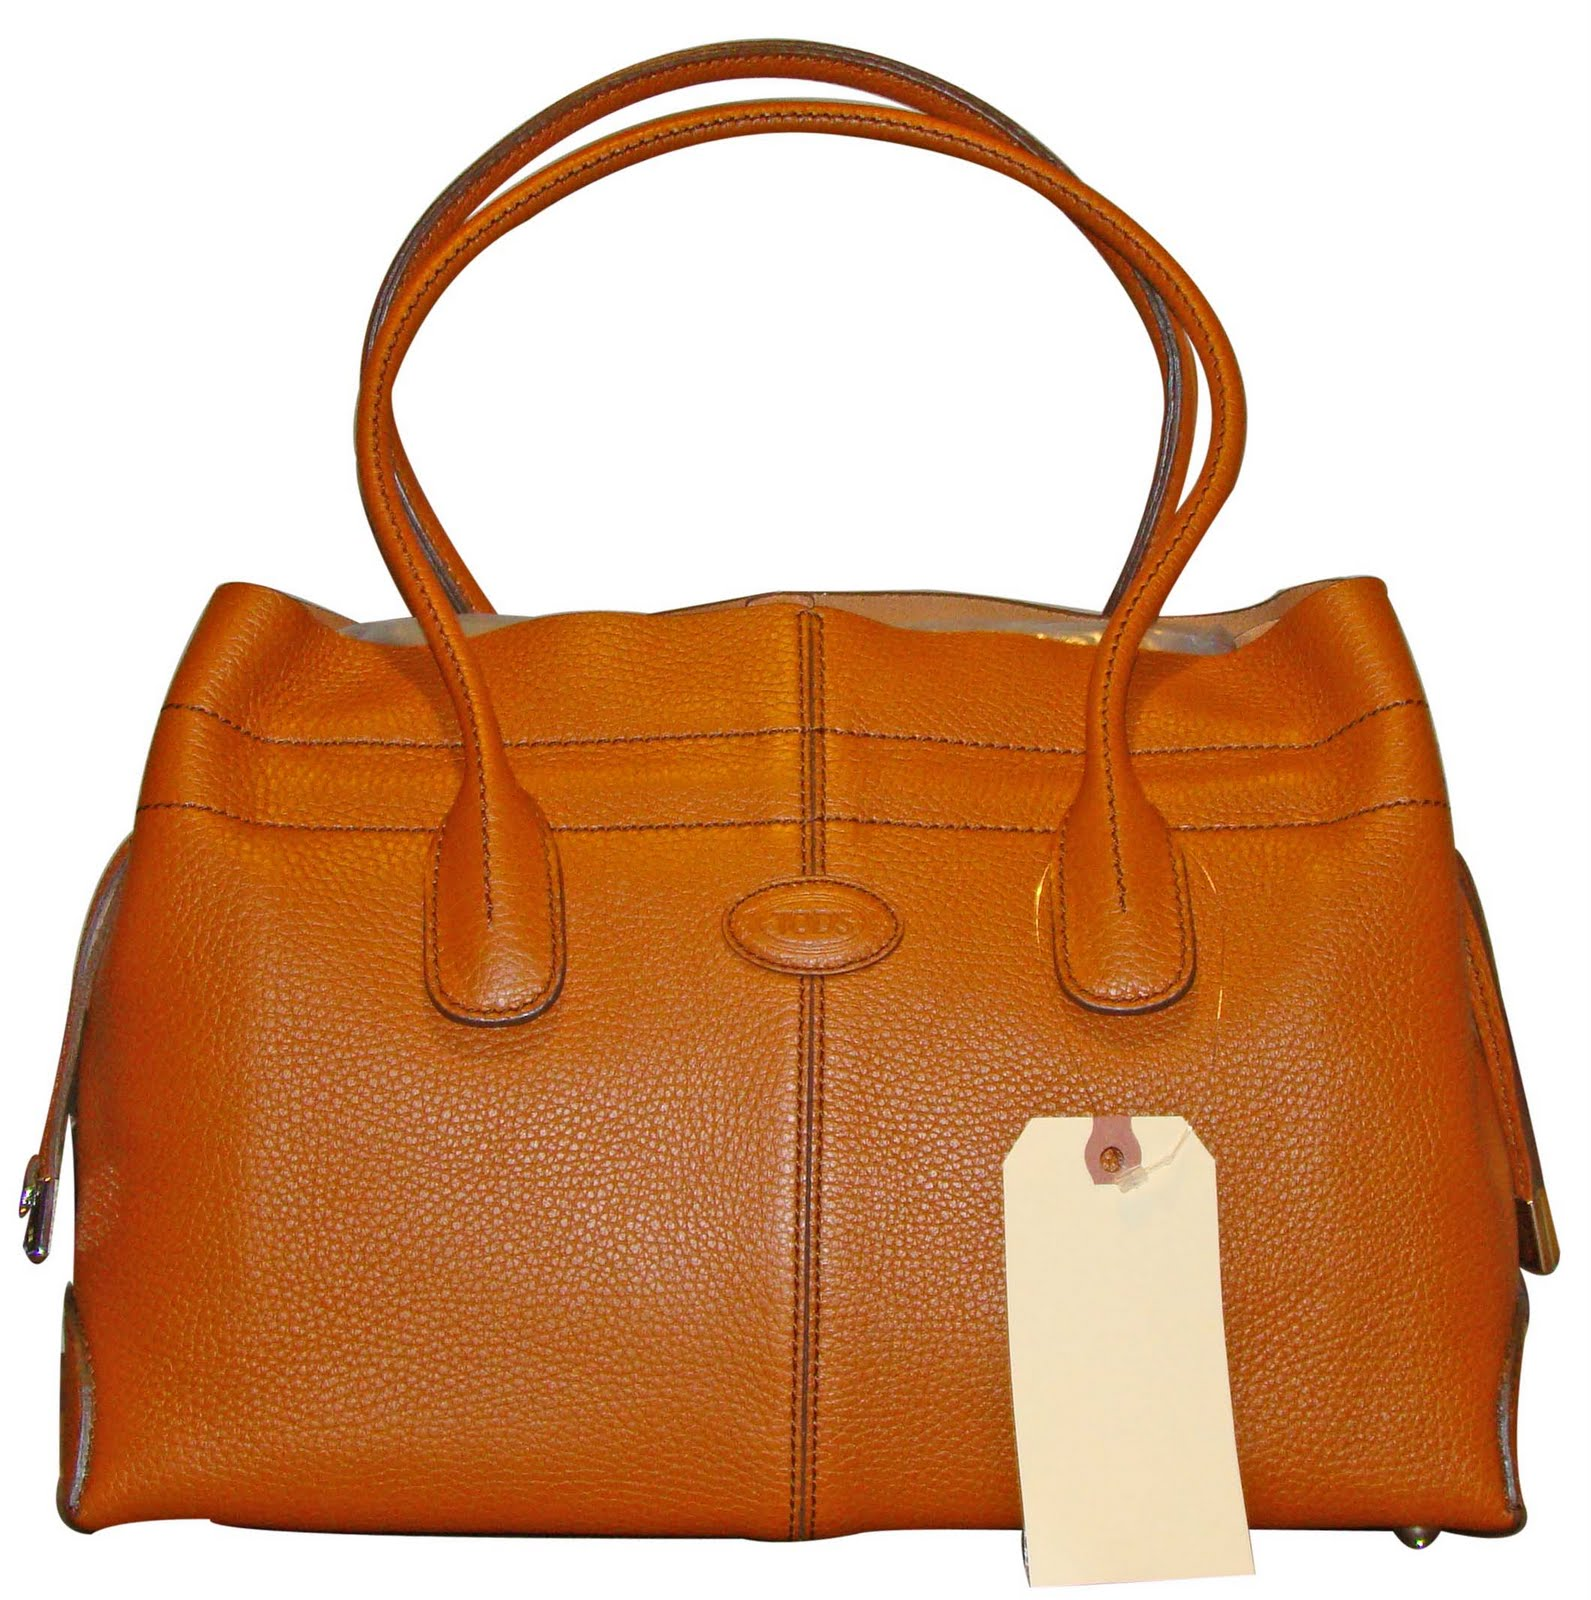 nycchic handbags white tod s handbag for summer